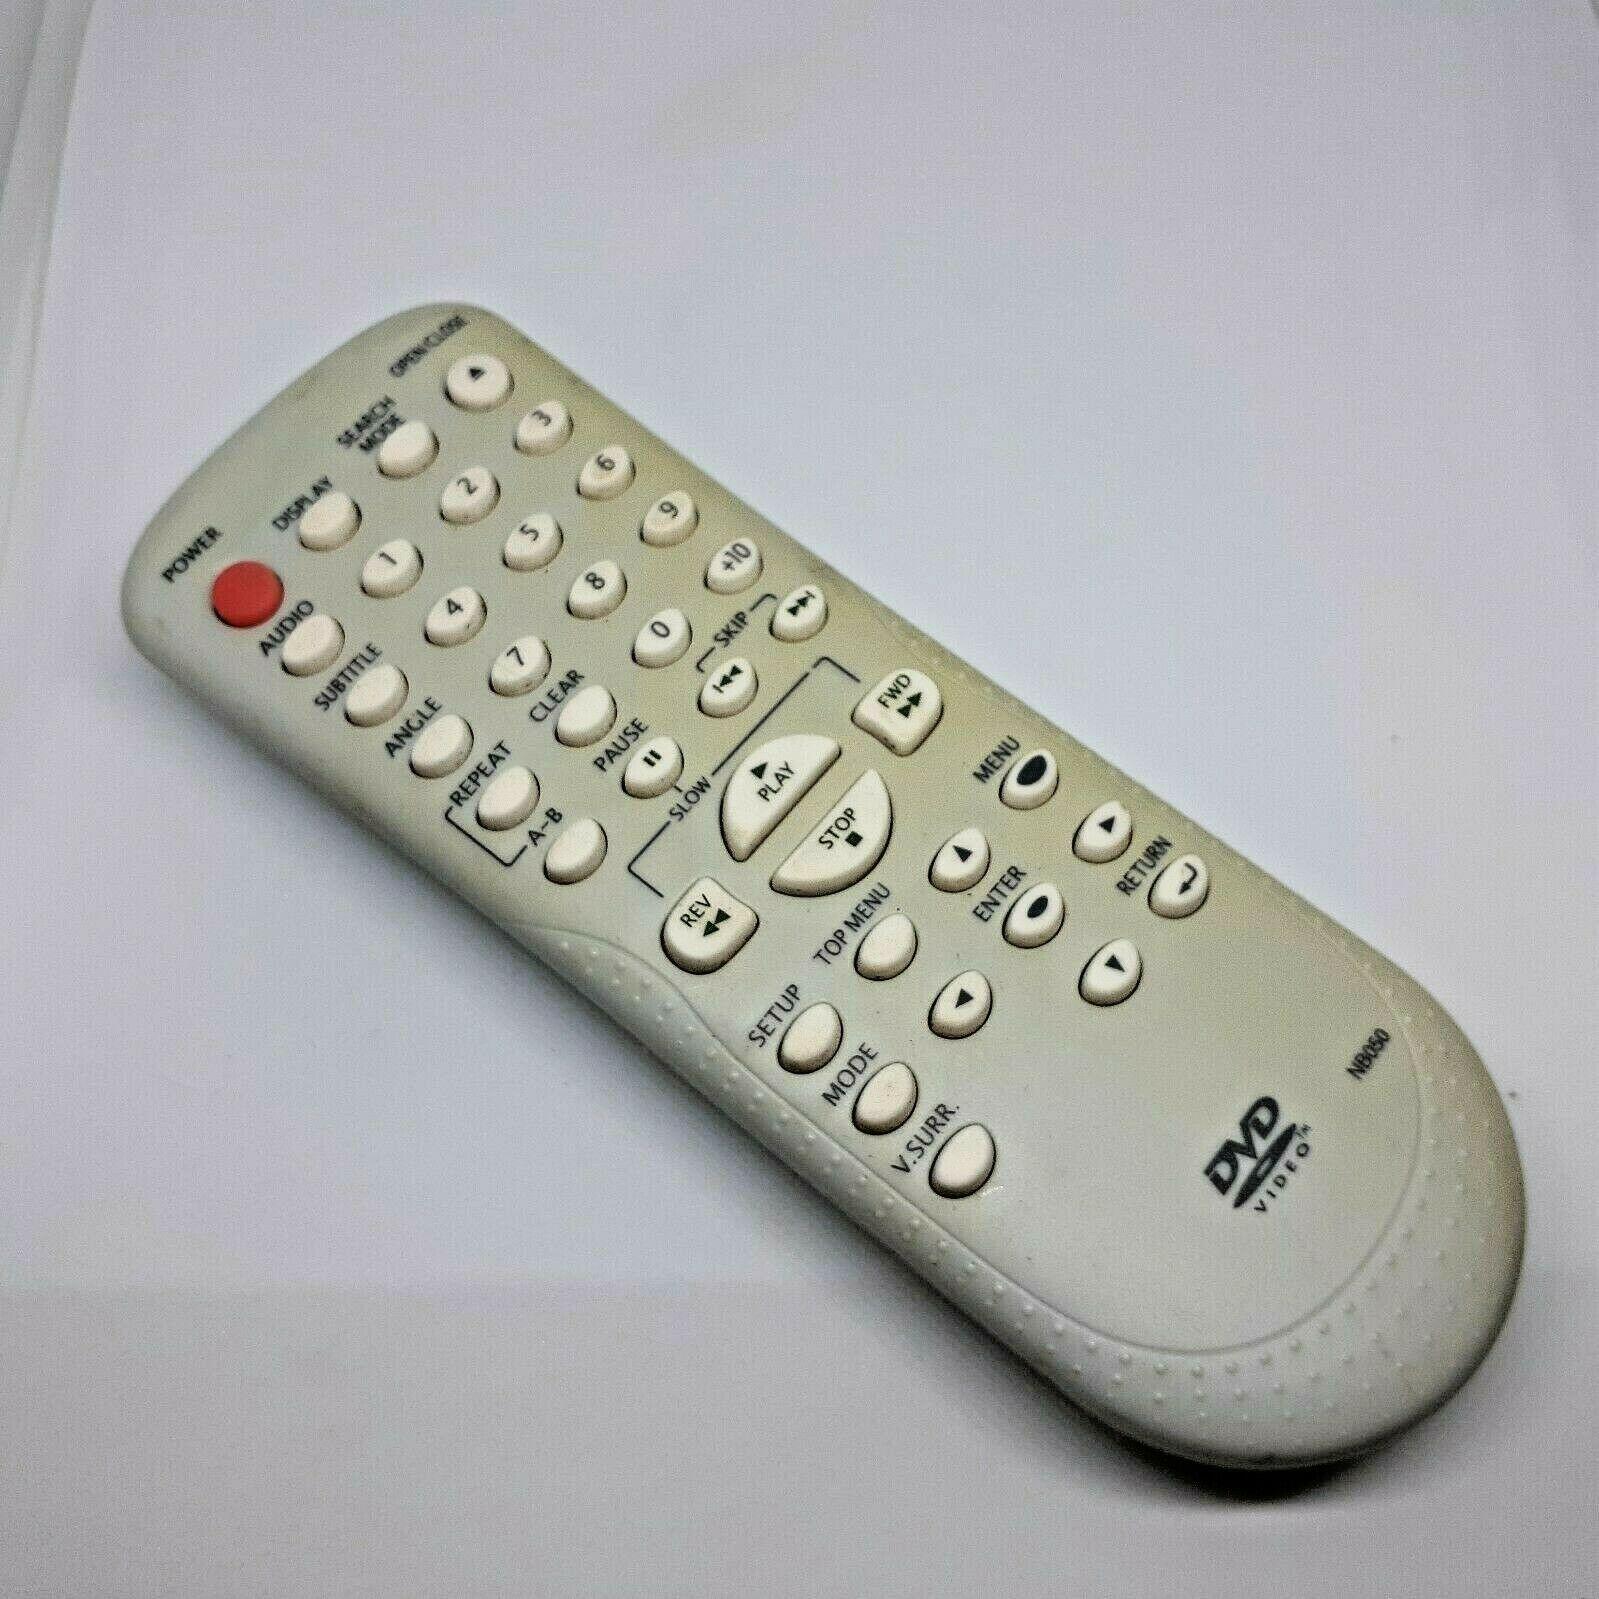 DVD Video Nb050 Remote Control Symphonic Funai Emerson Sylvania Magnavox-TESTED